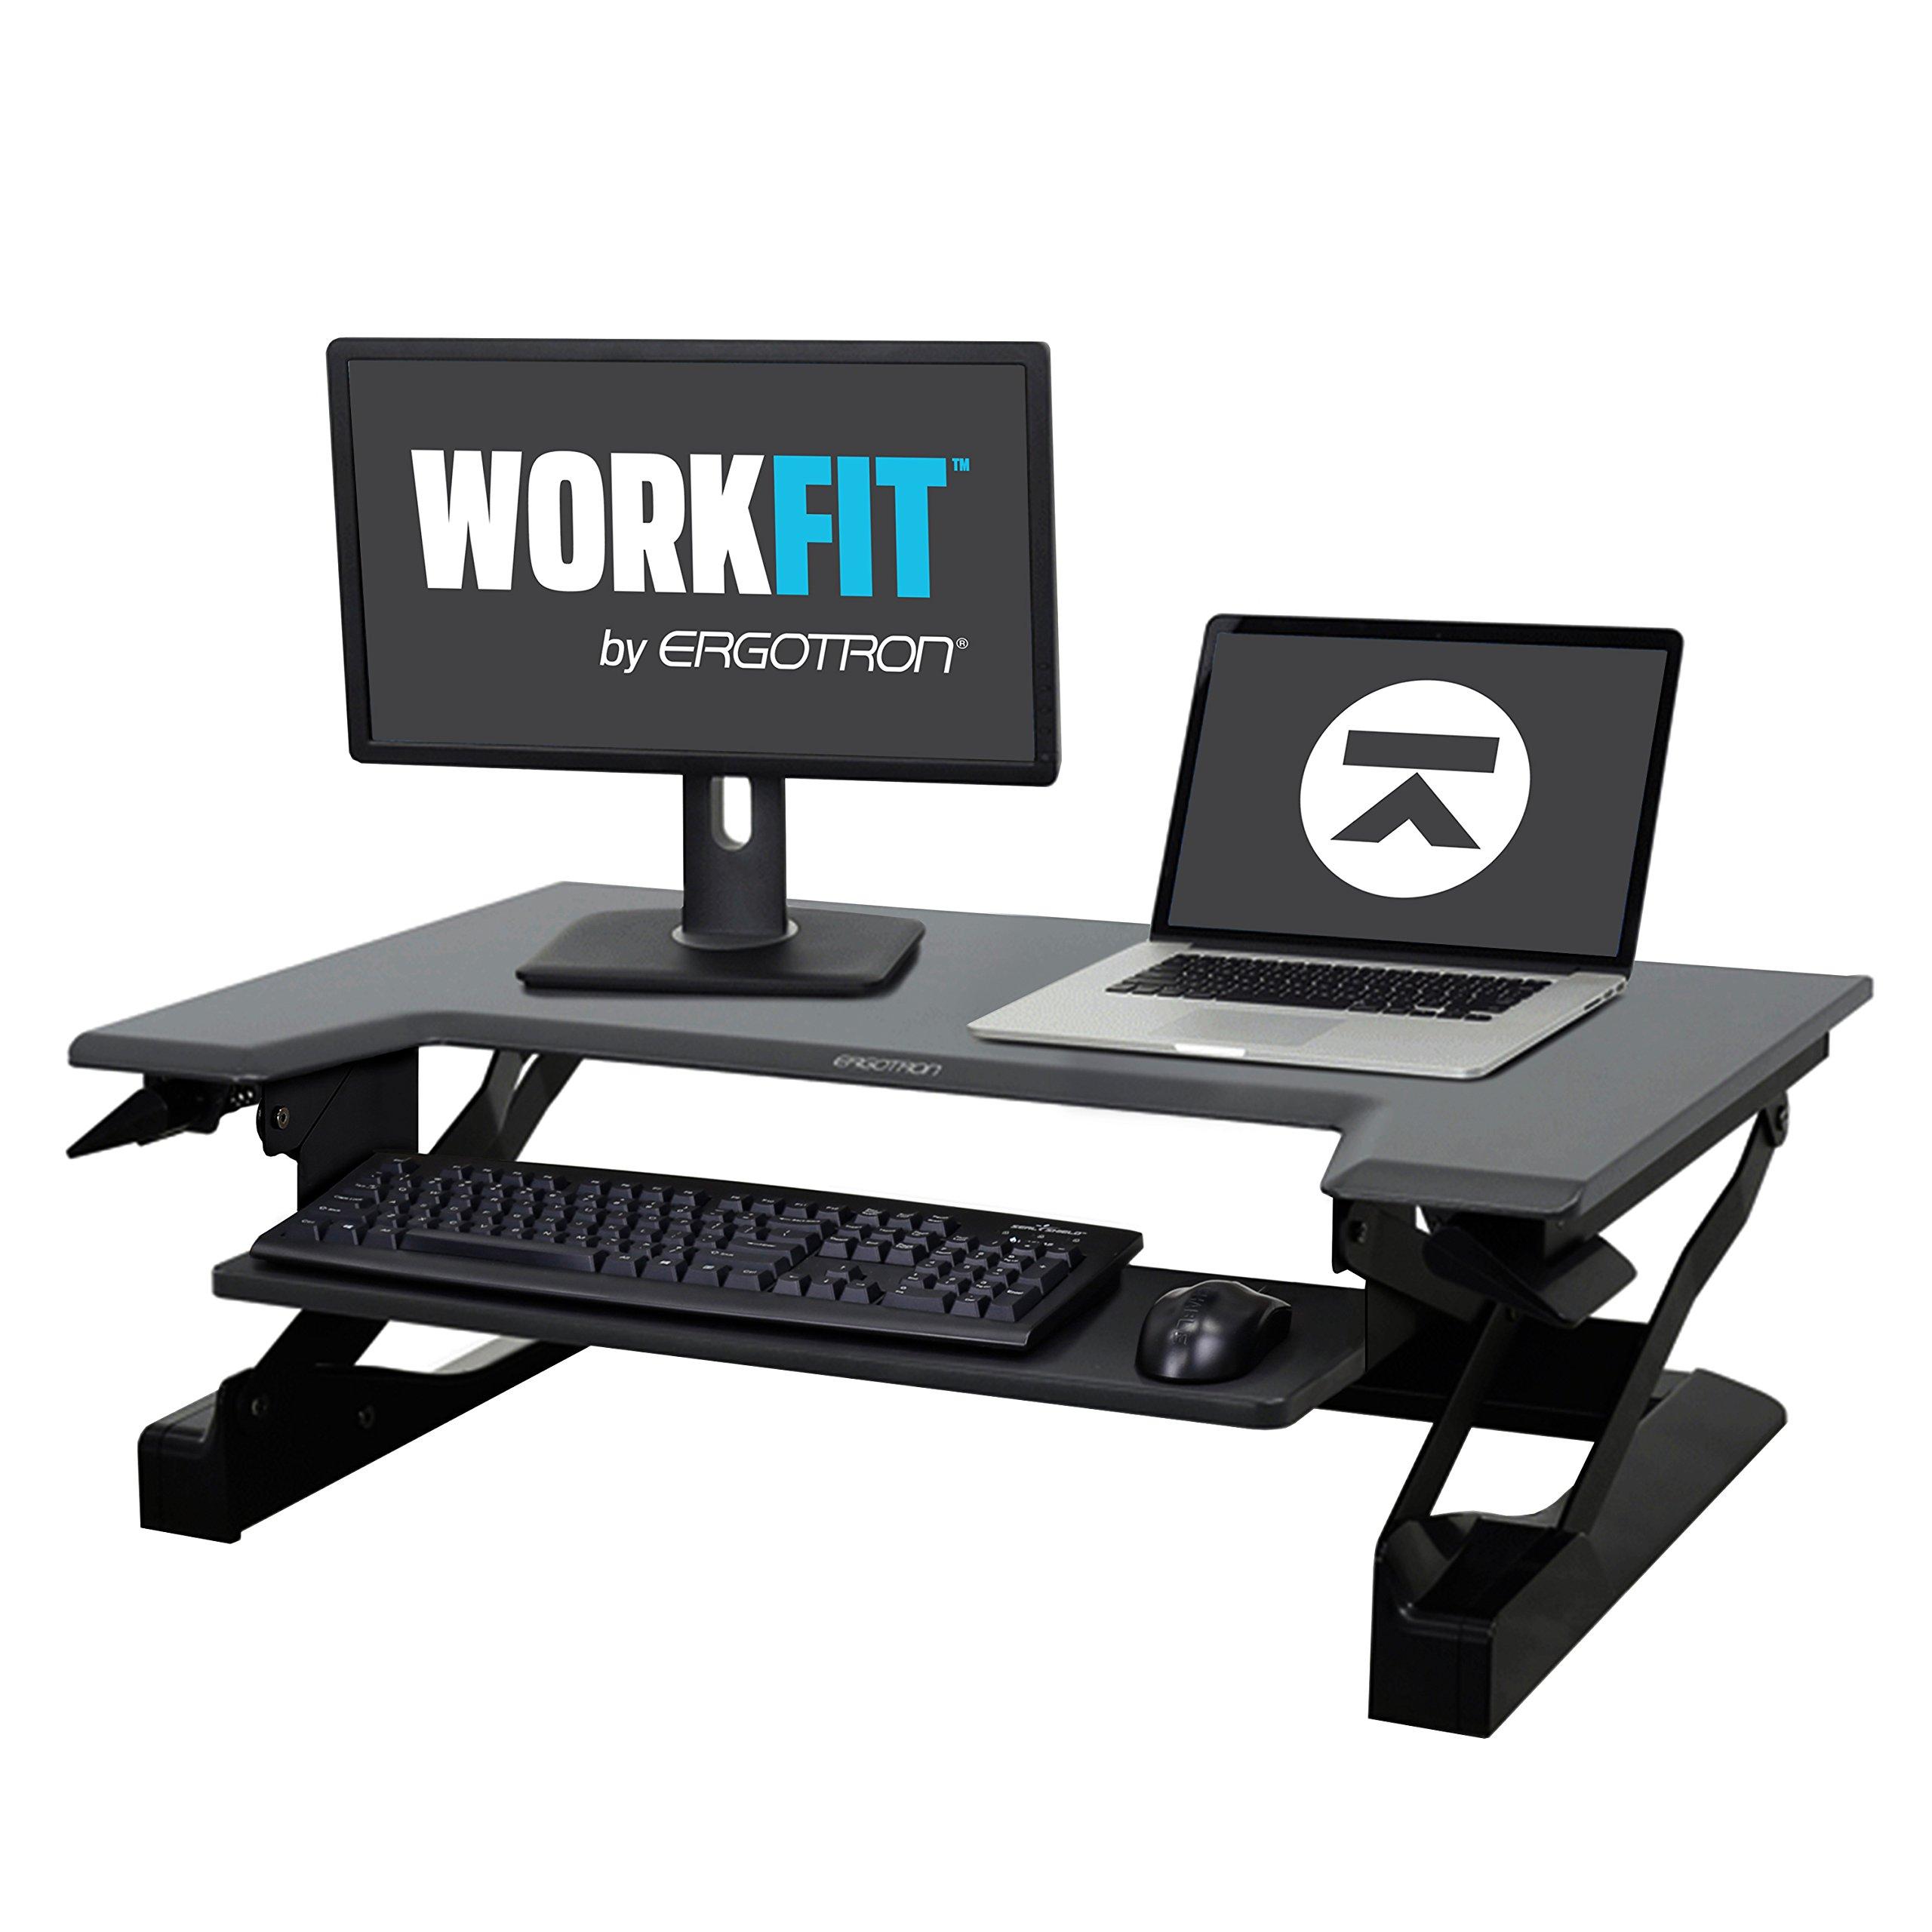 Ergotron WorkFit-T, Sit-Stand Desk Converter | Black, 35'' wide | For Tabletops by Ergotron